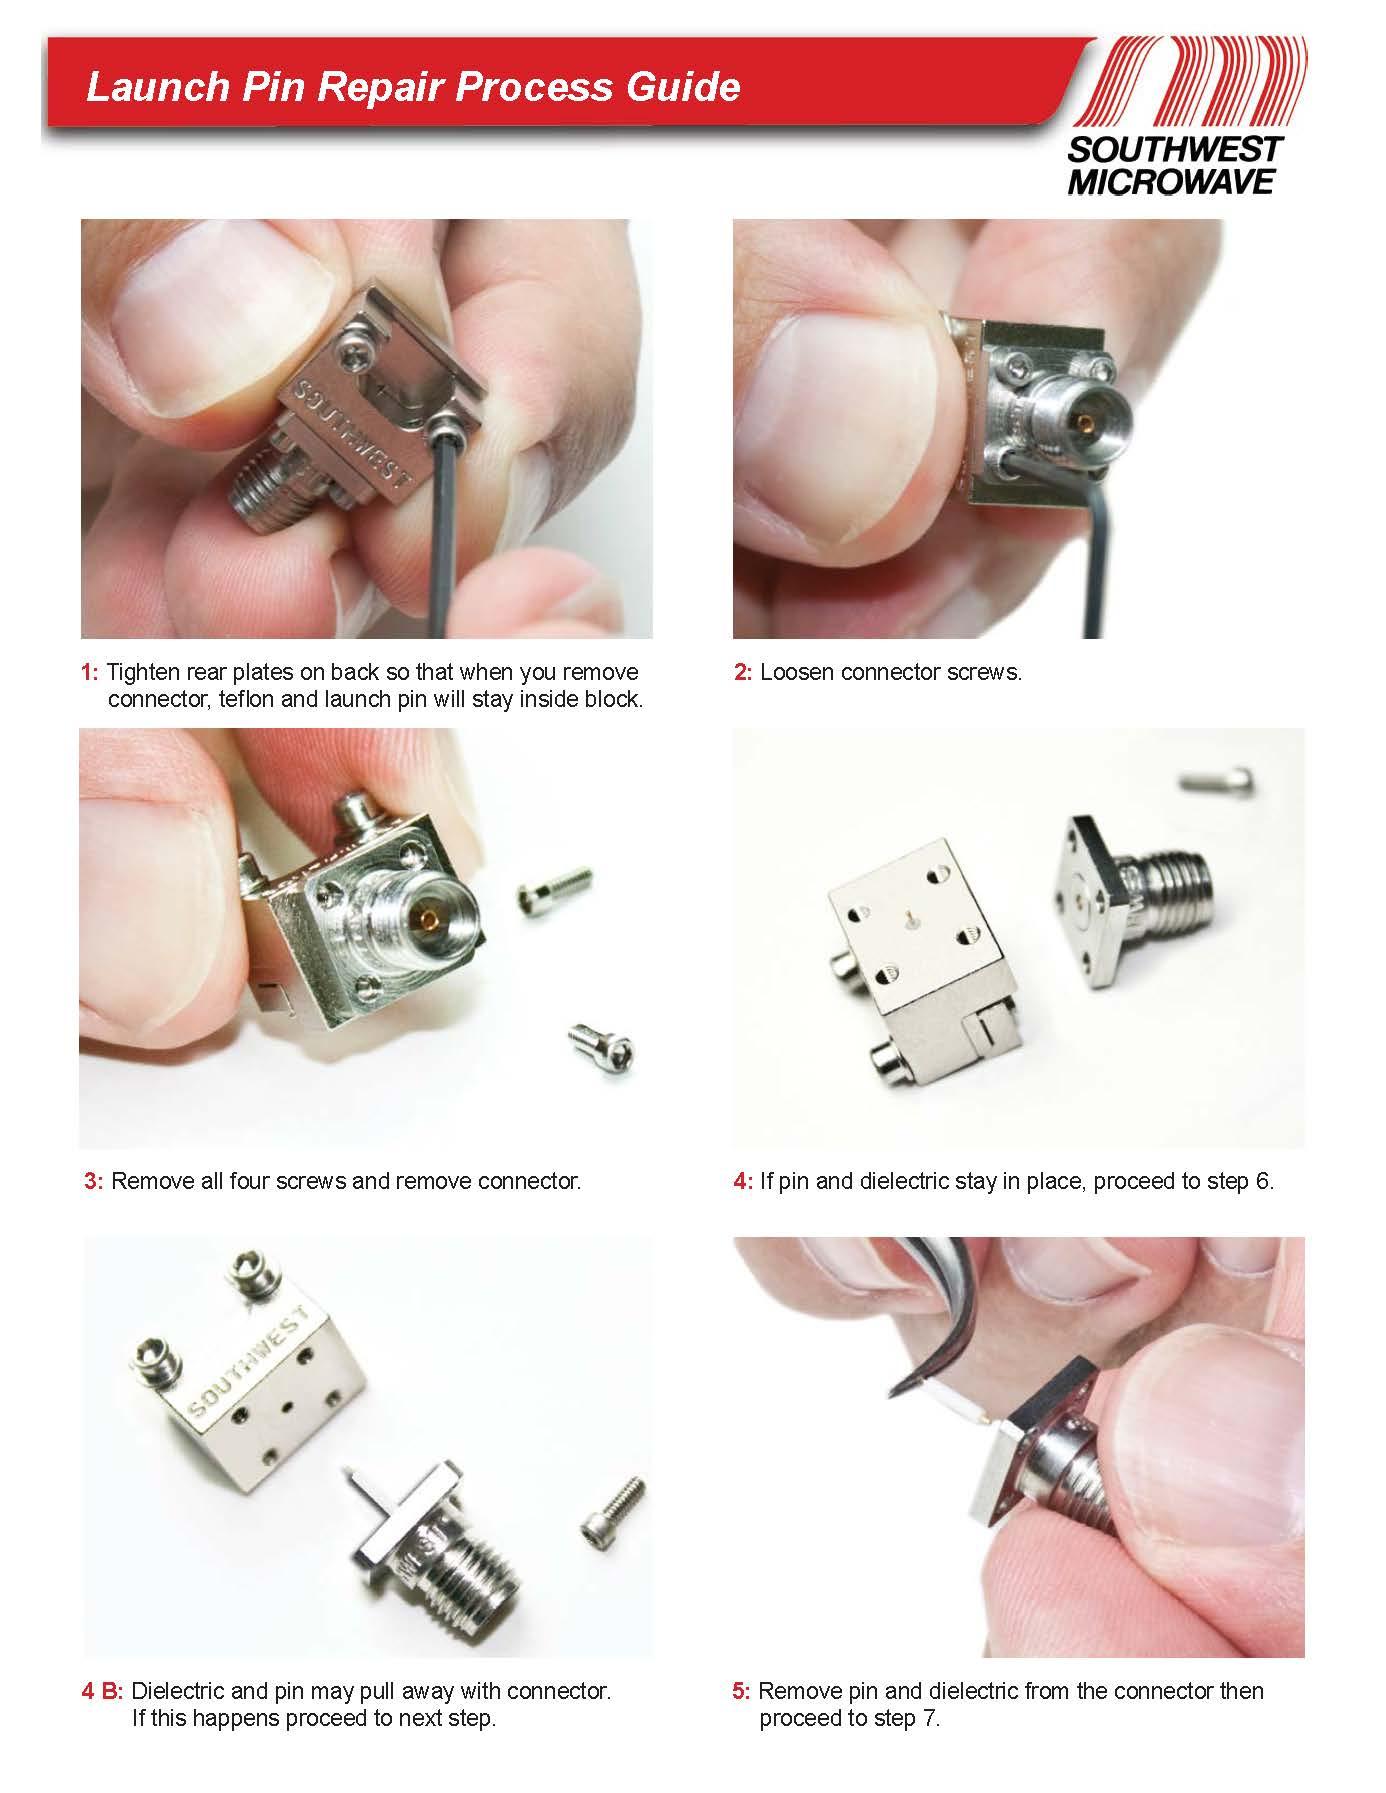 smi-guide-launch-pin-repair-page-1.jpg